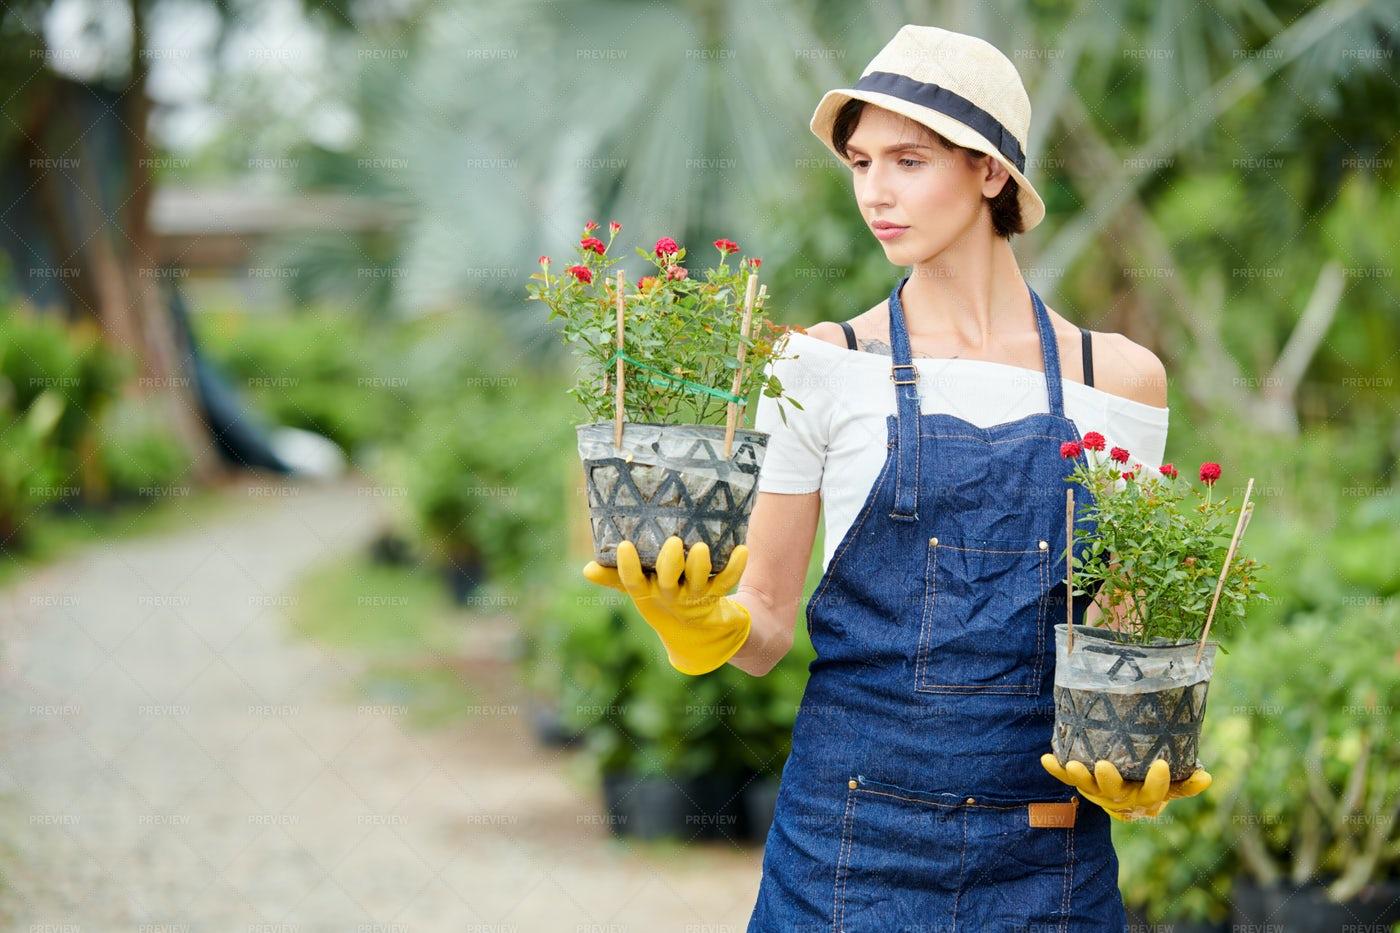 Gardener Looking At Flower Pot: Stock Photos